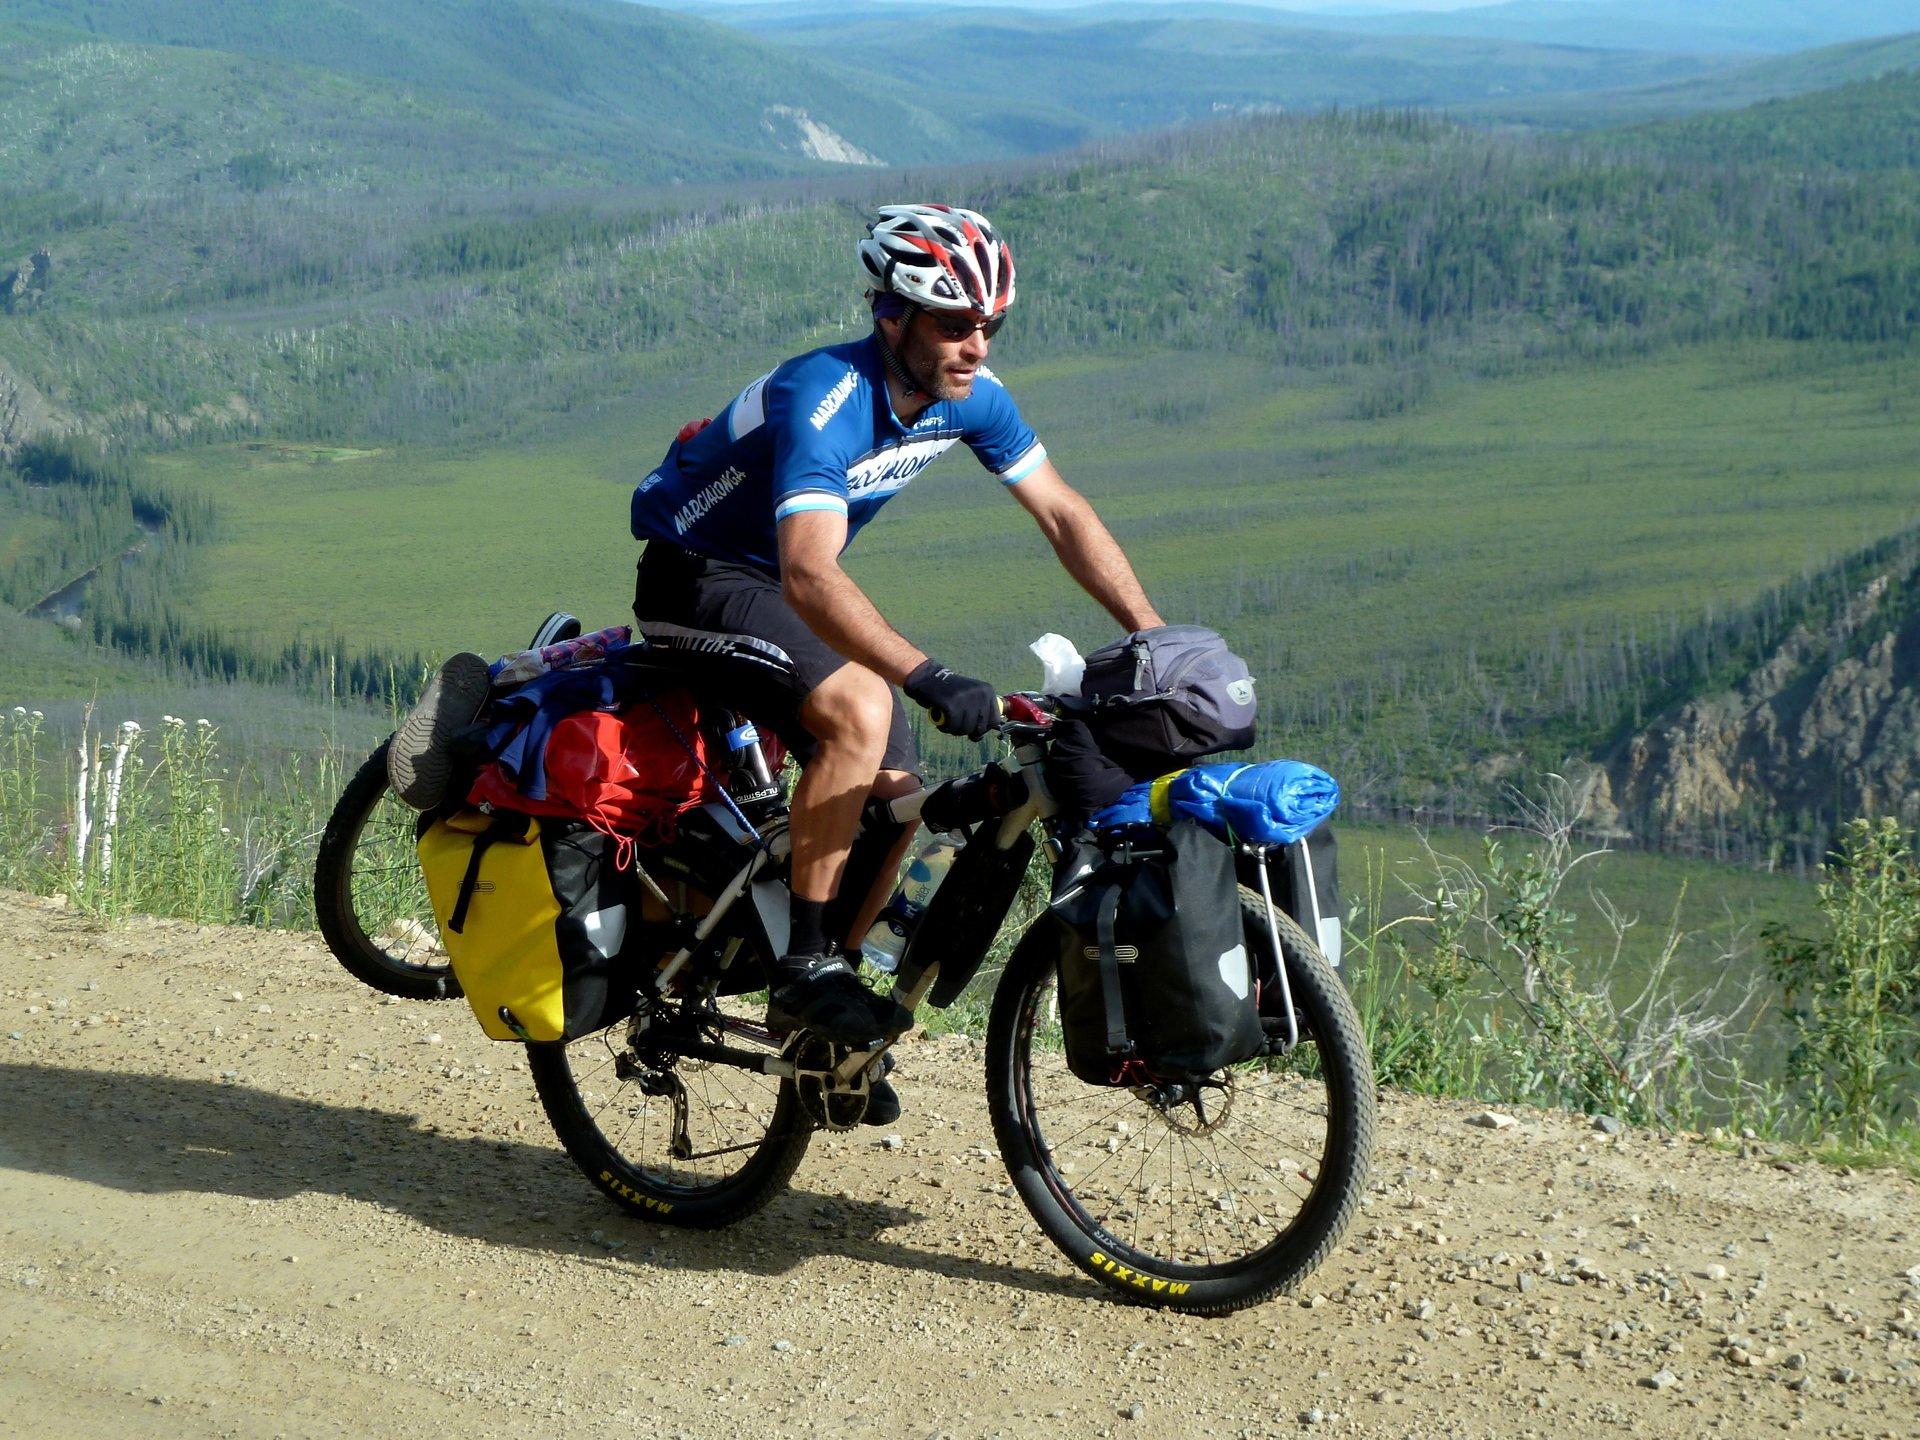 una mountain bike rossa